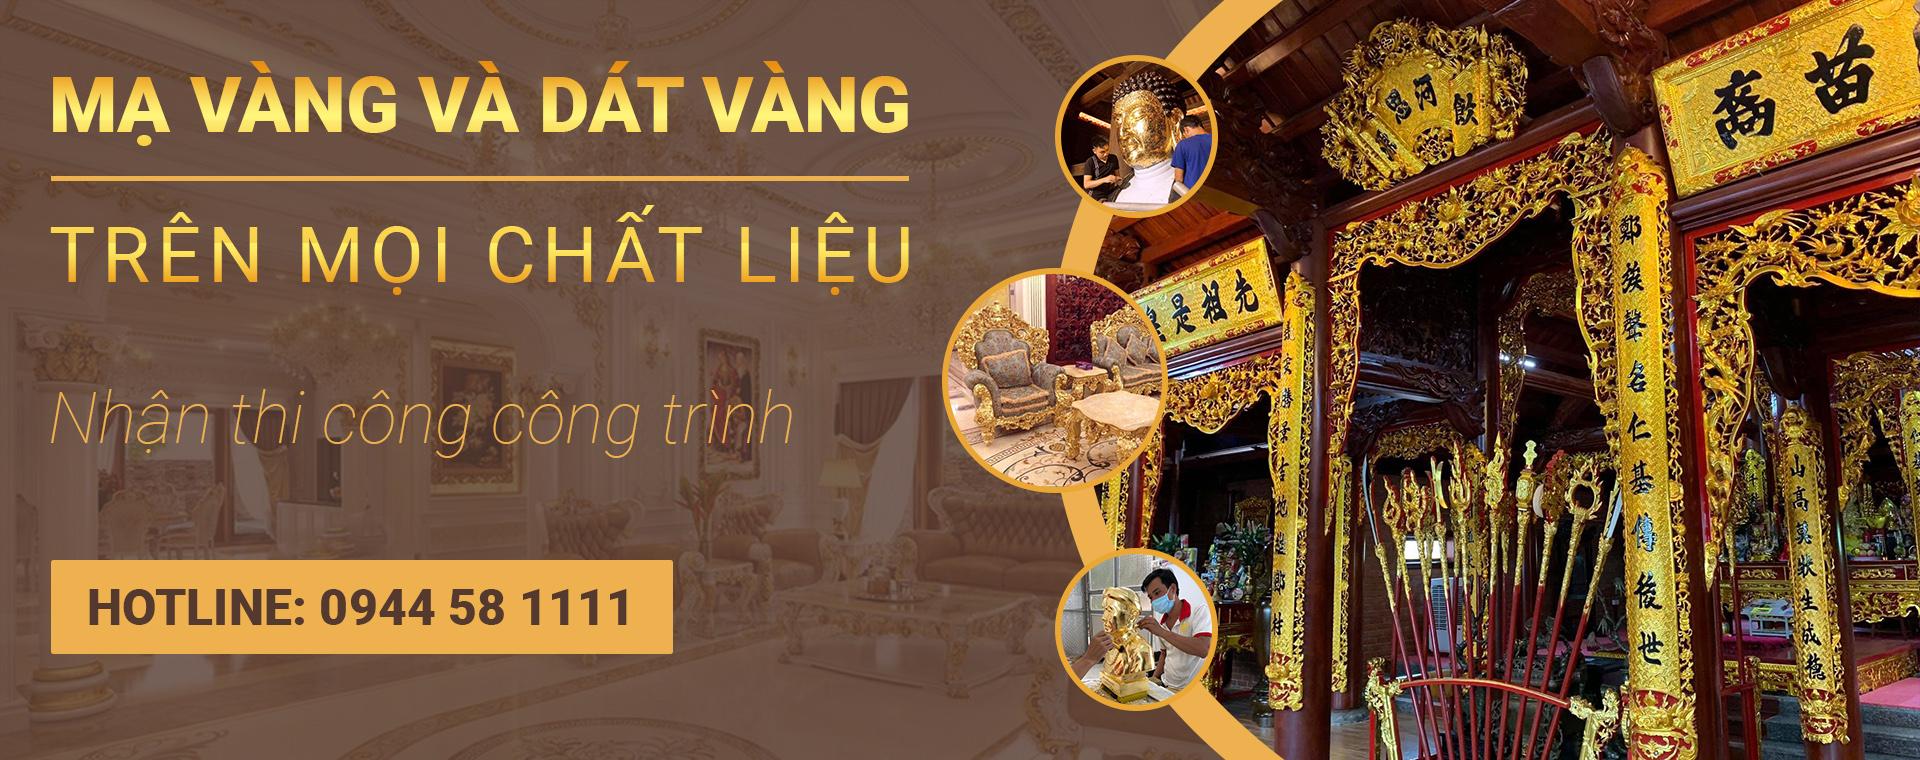 do-dong-dung-quang-ha-nhan-ma-vang-va-dat-vang-tren-moi-chat-lieu